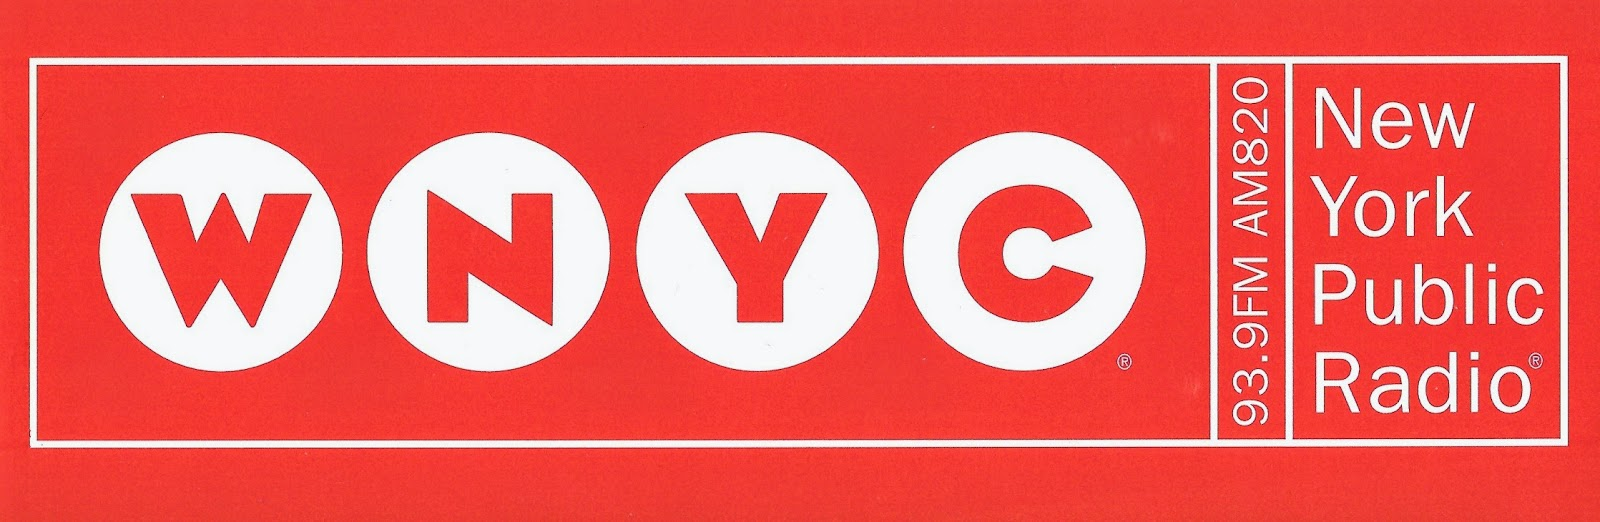 Radio Remnant Ads on WNYC FM - WNYC Radio - New York 888